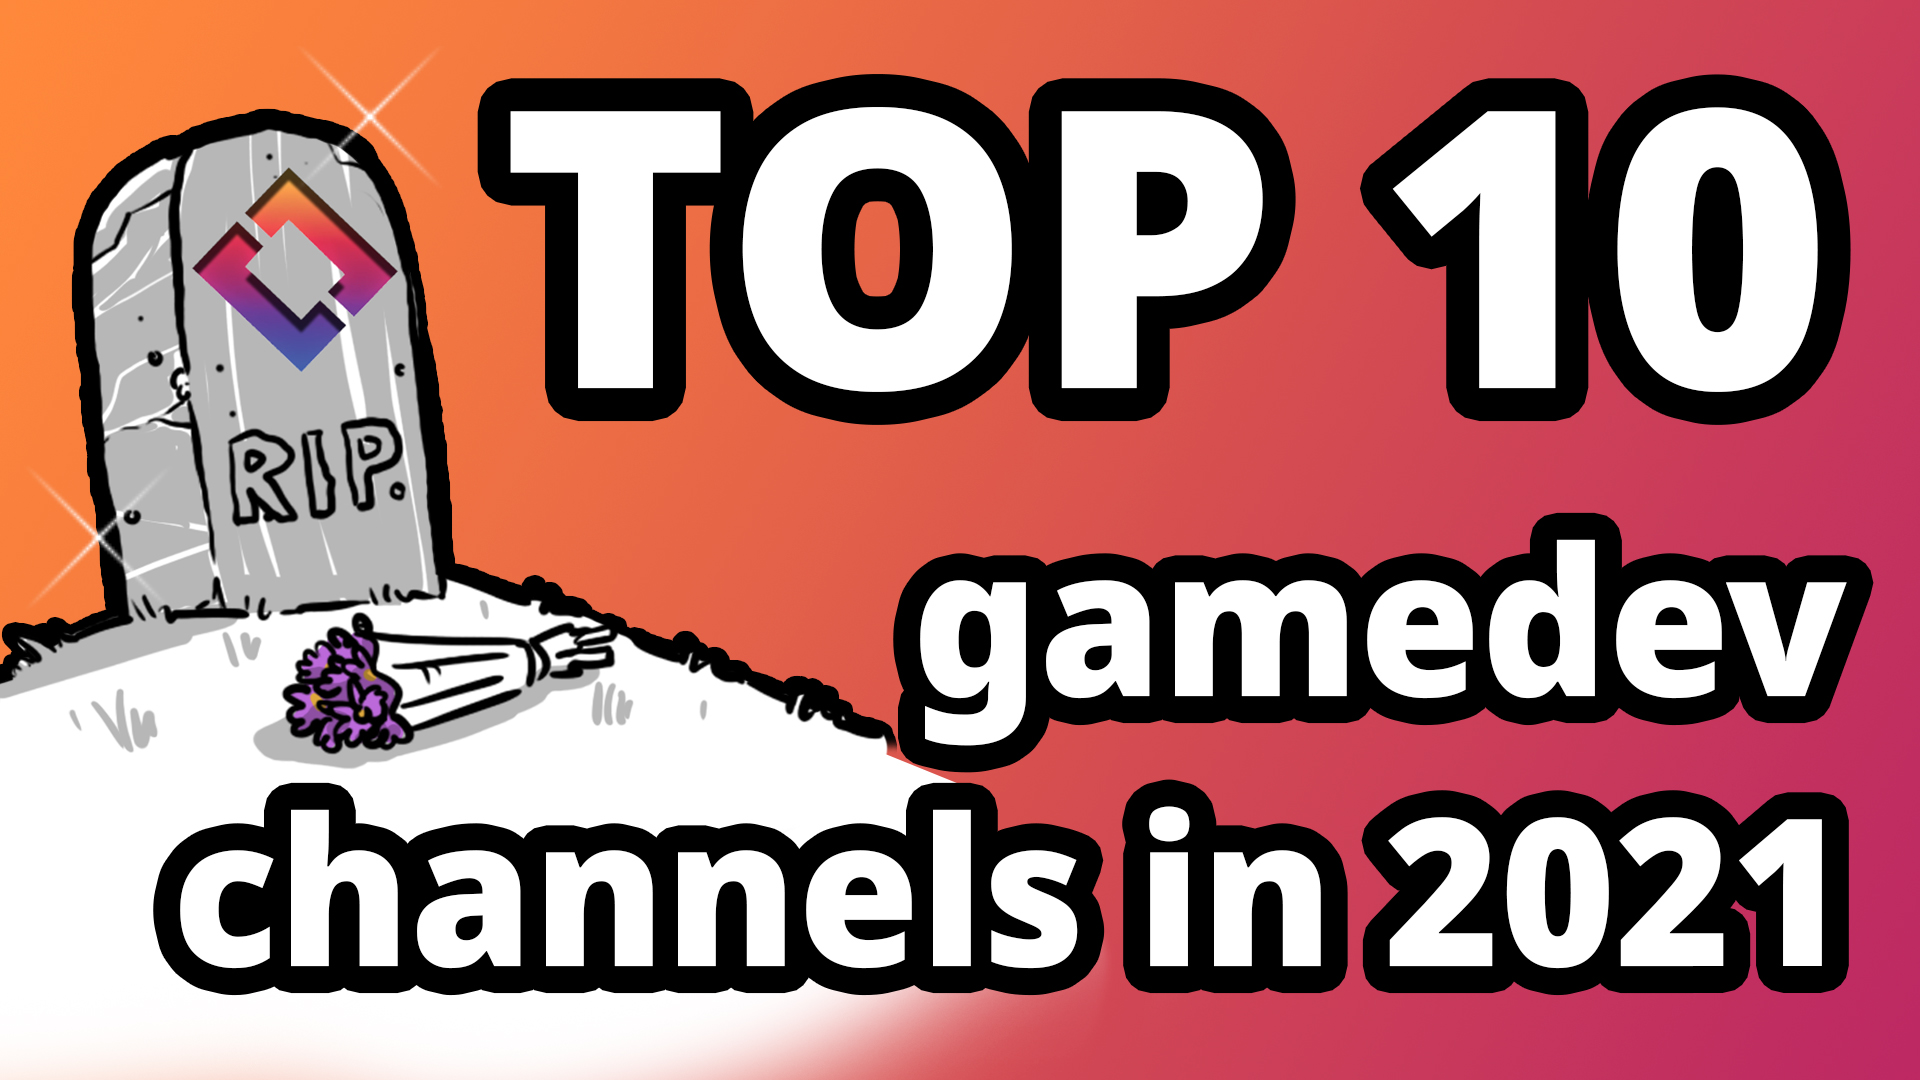 Top 10 GameDev Channels in 2021